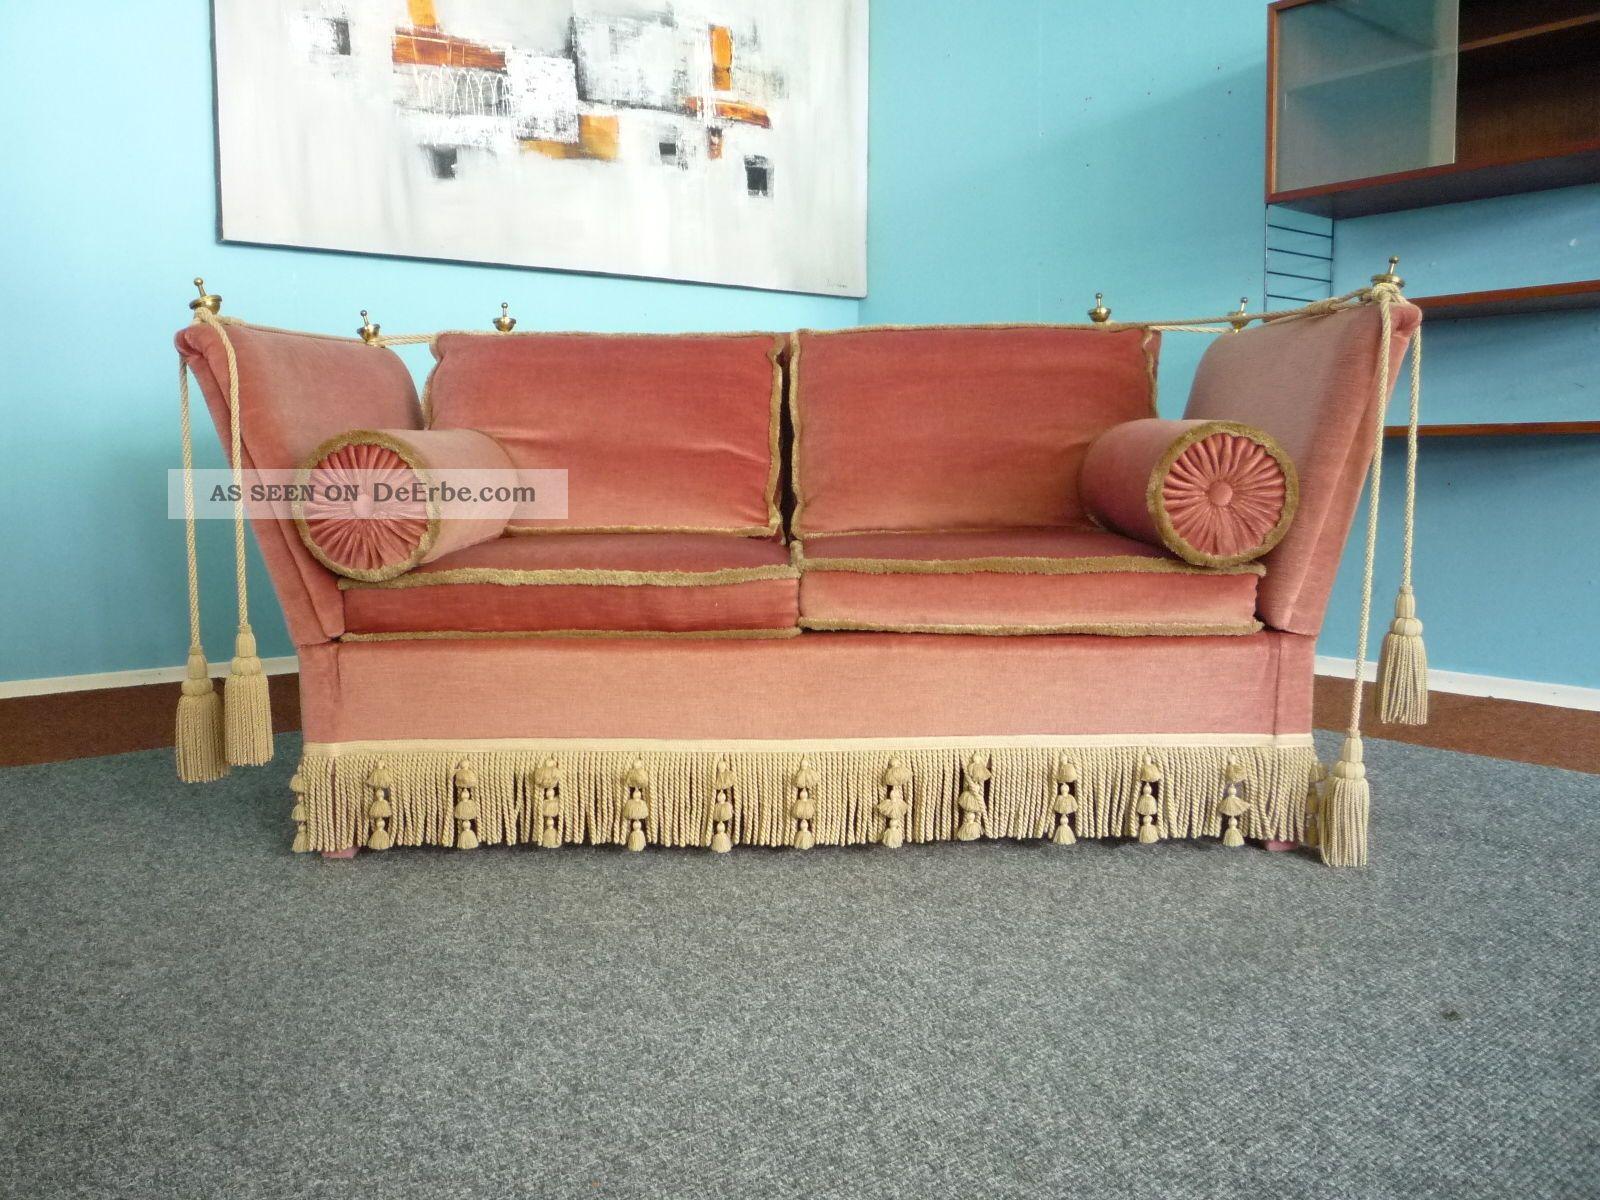 couch 50er trendy knoll antimott sofa dreisitzer couch er er jahre with couch 50er excellent. Black Bedroom Furniture Sets. Home Design Ideas